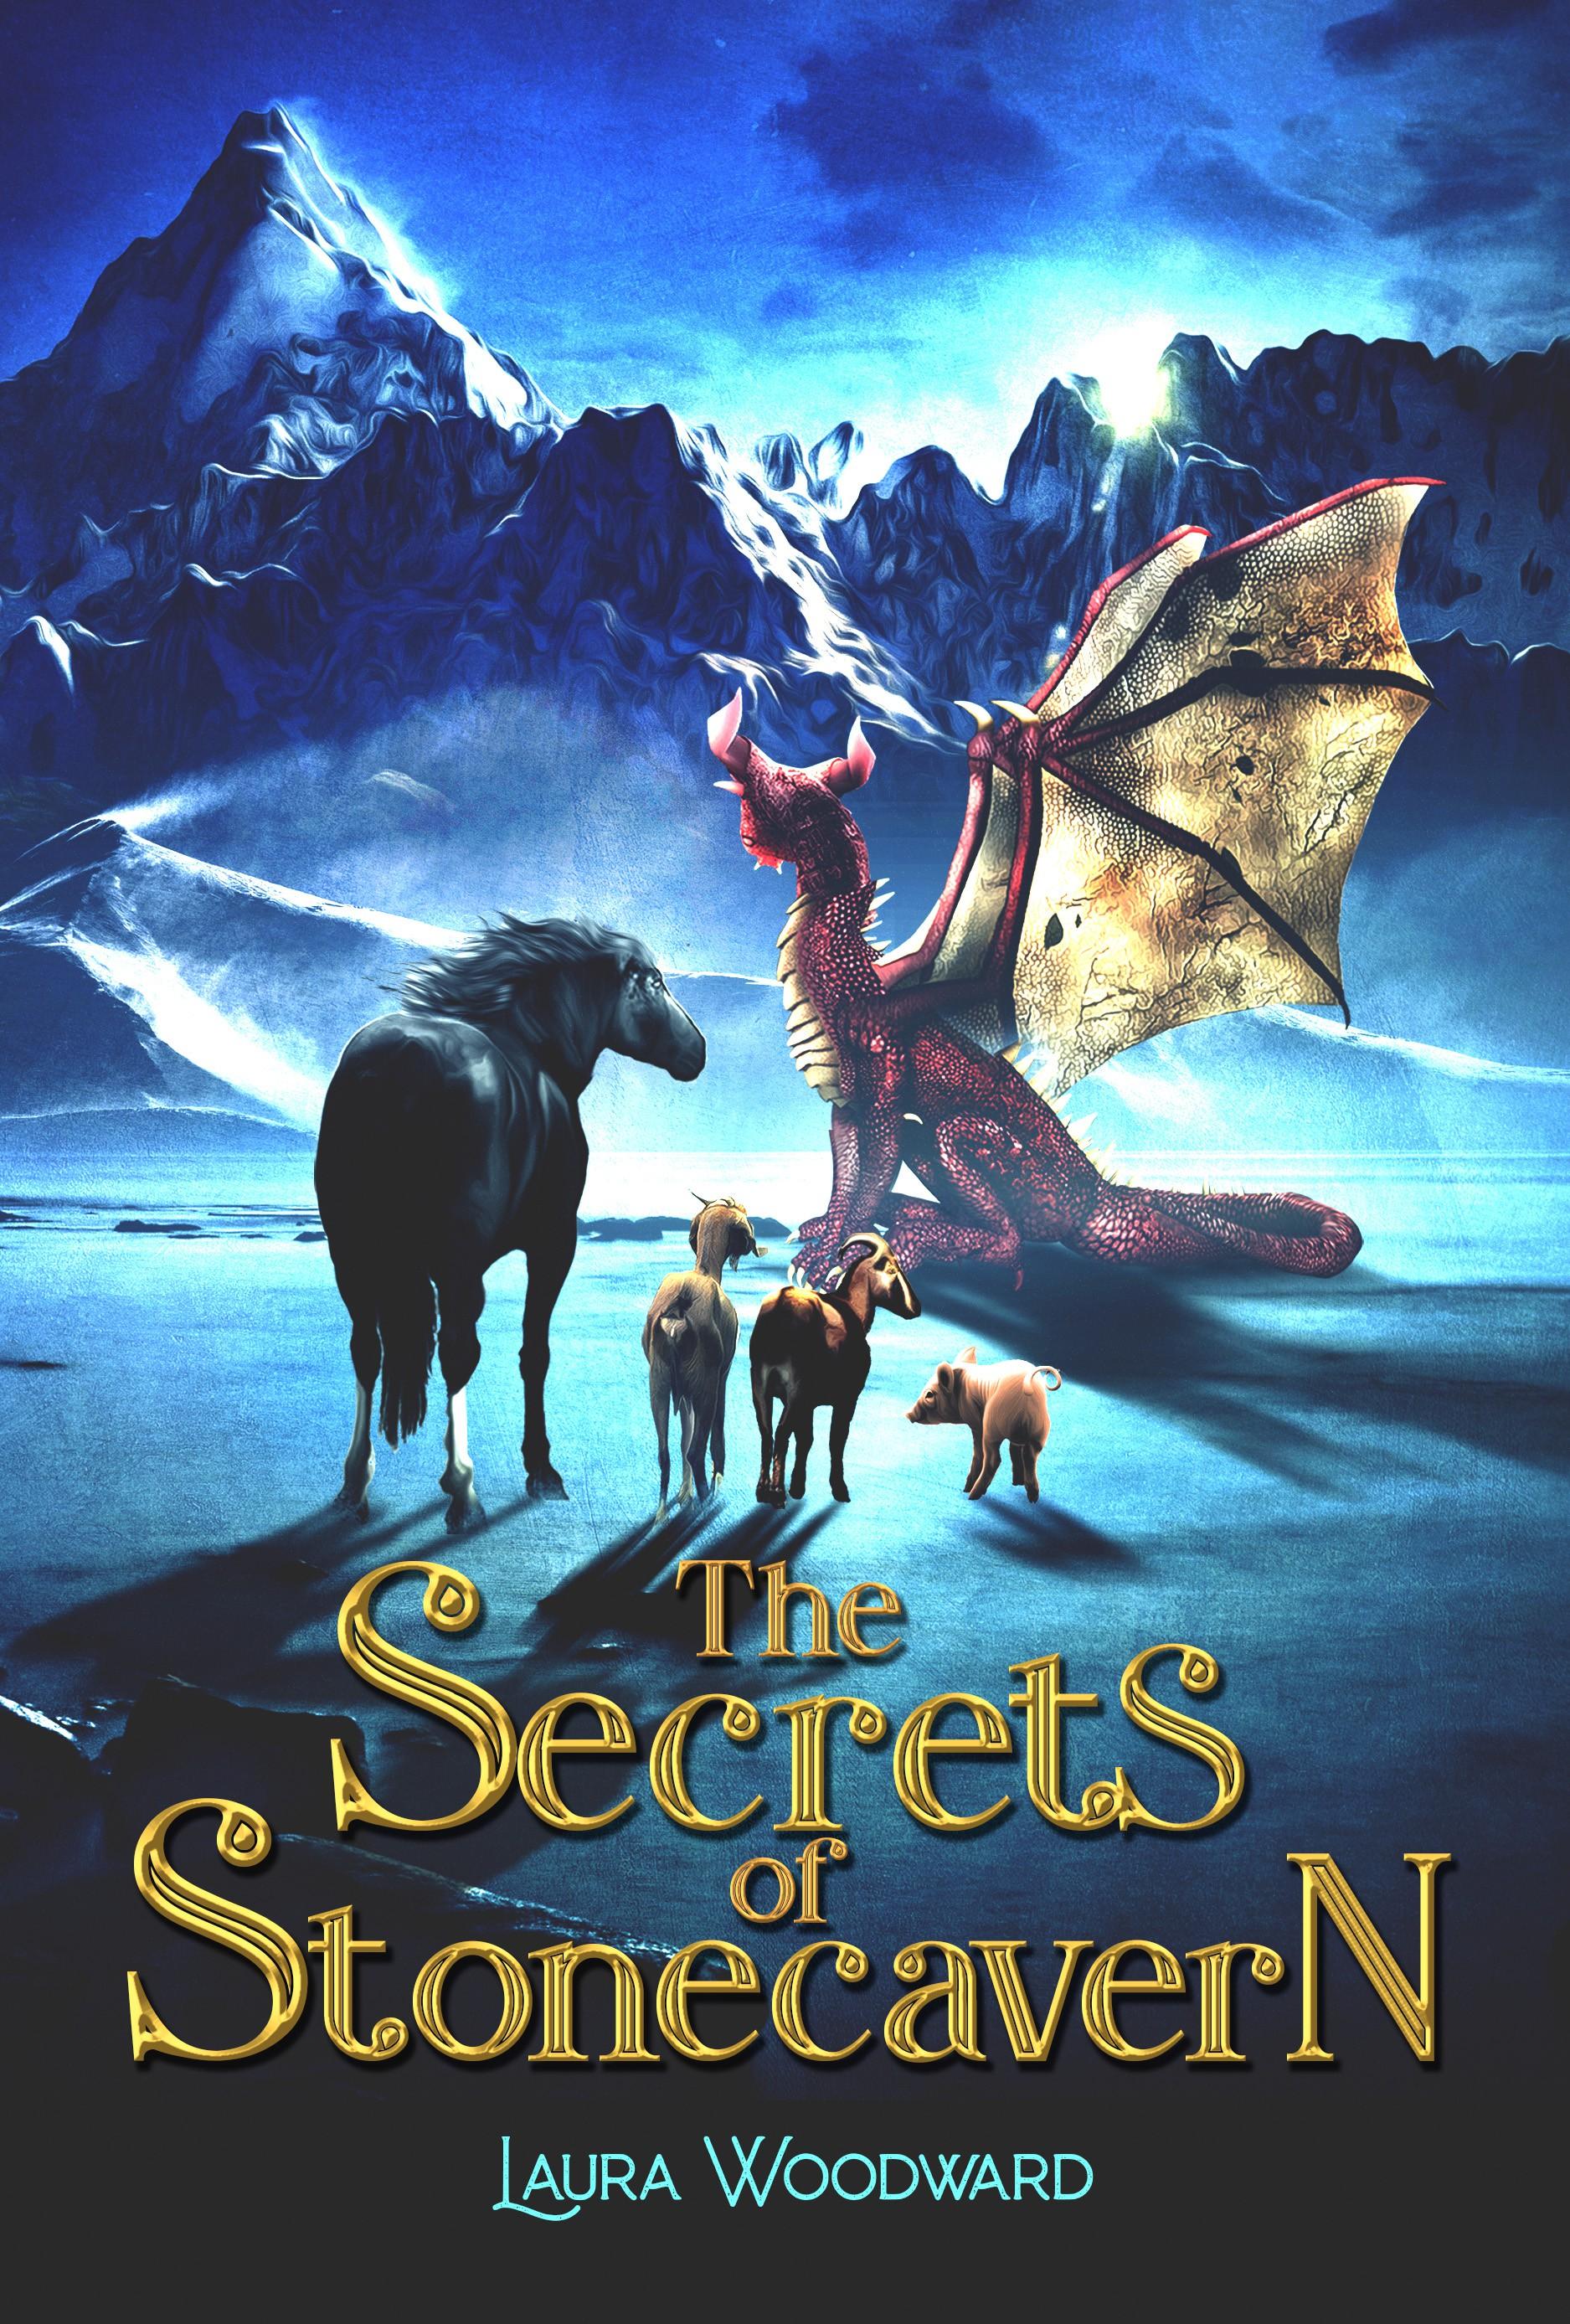 The Secrets of Stonecavern